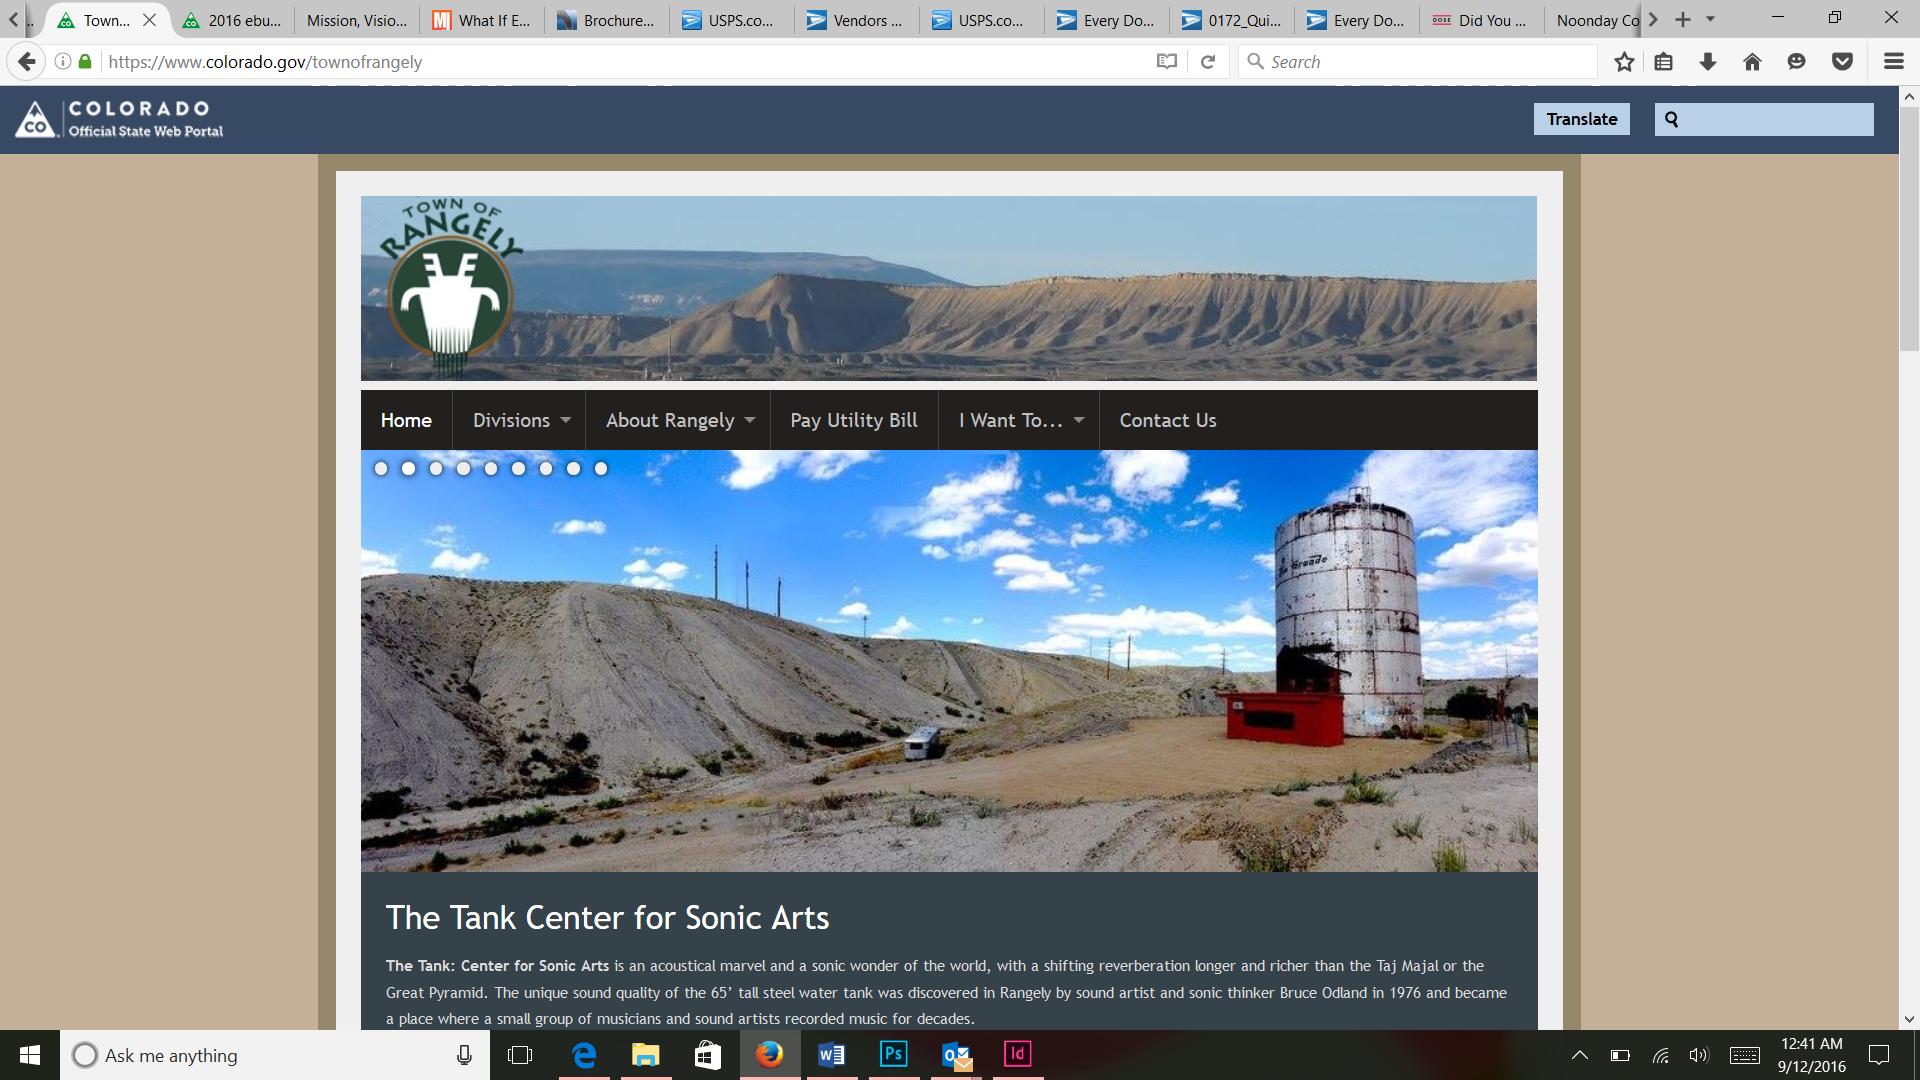 Town of Rangely website